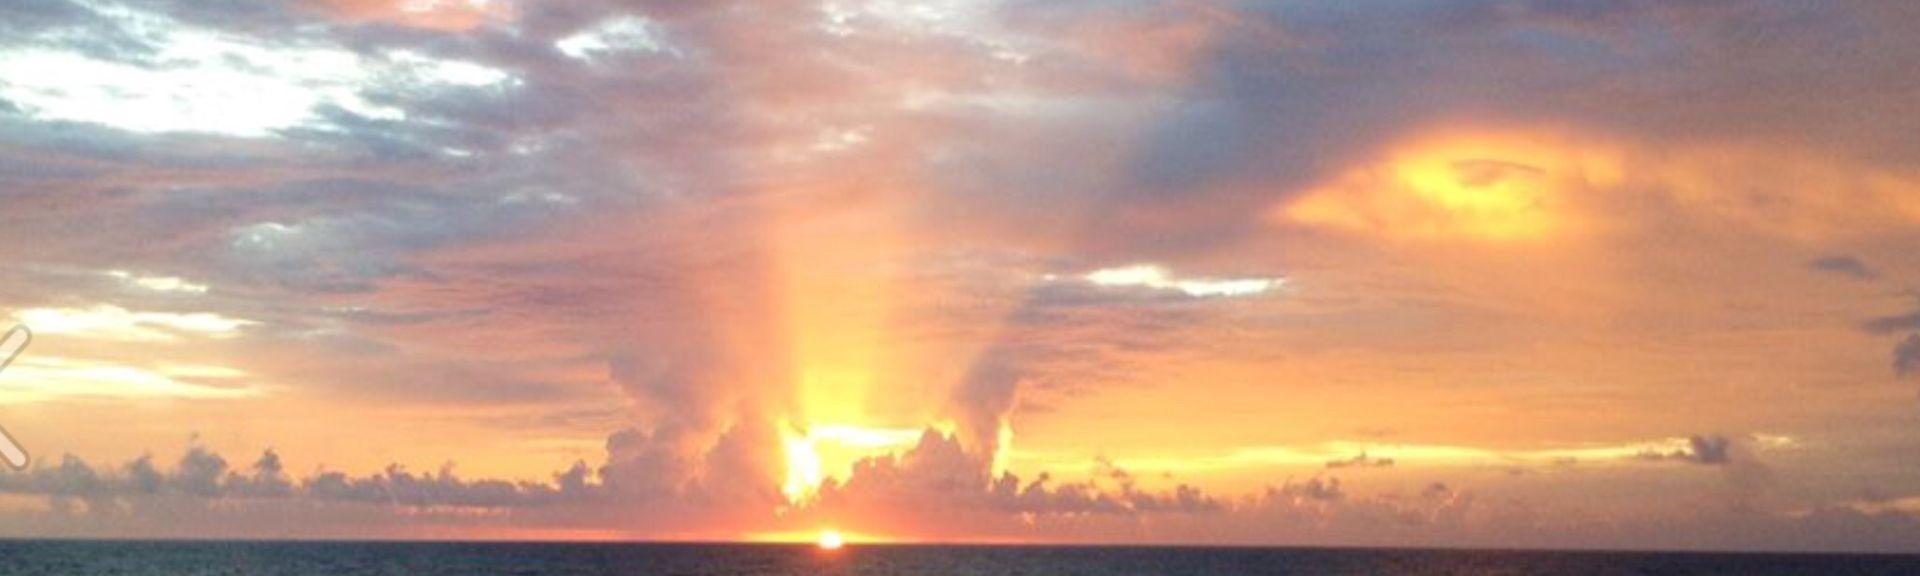 Sea Coast Condominium, New Smyrna Beach, Florida, United States of America